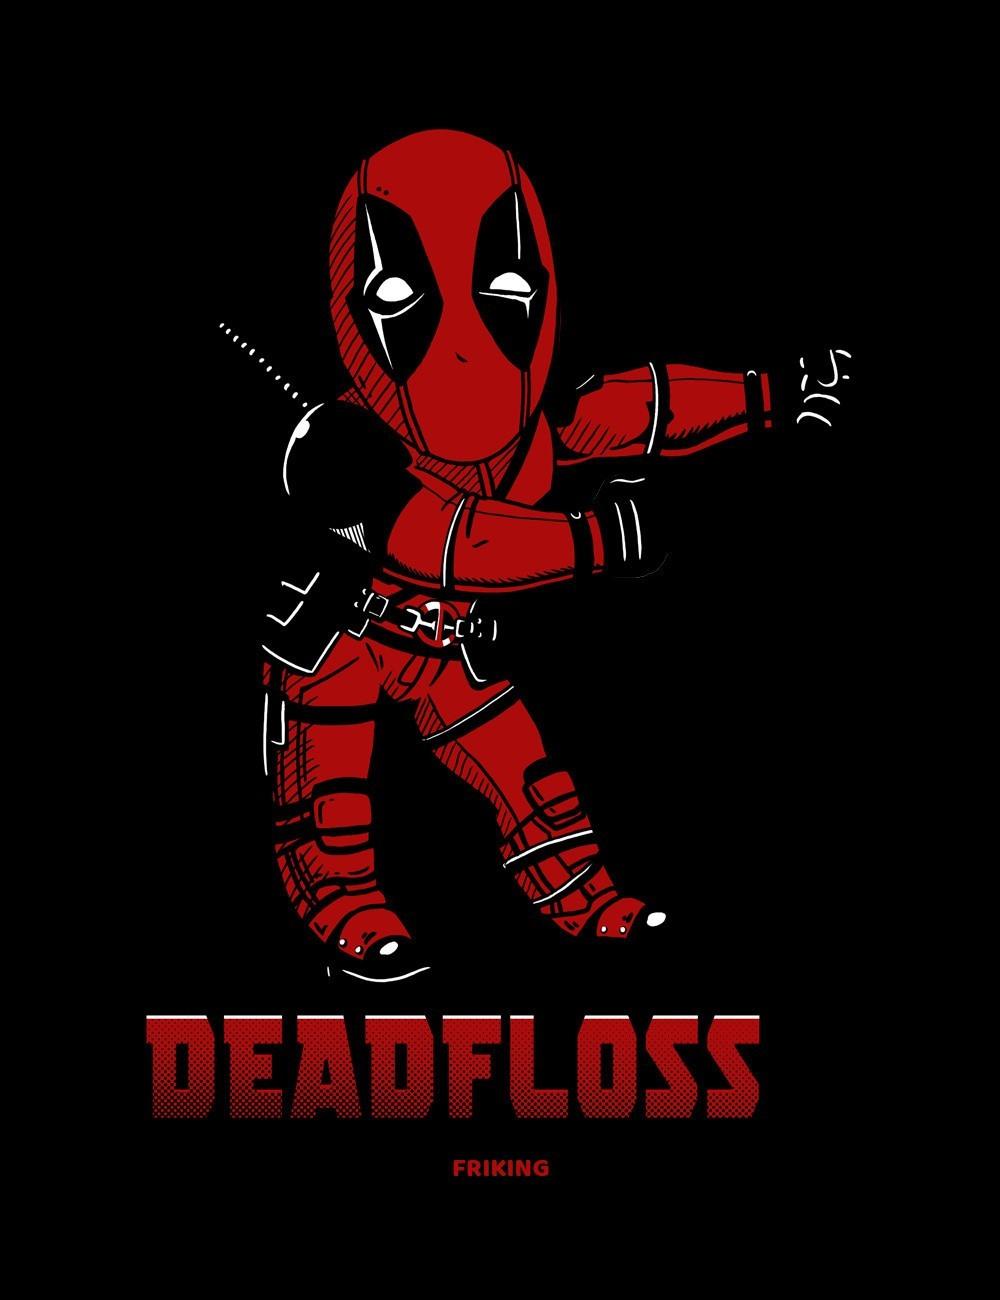 Deadfloss